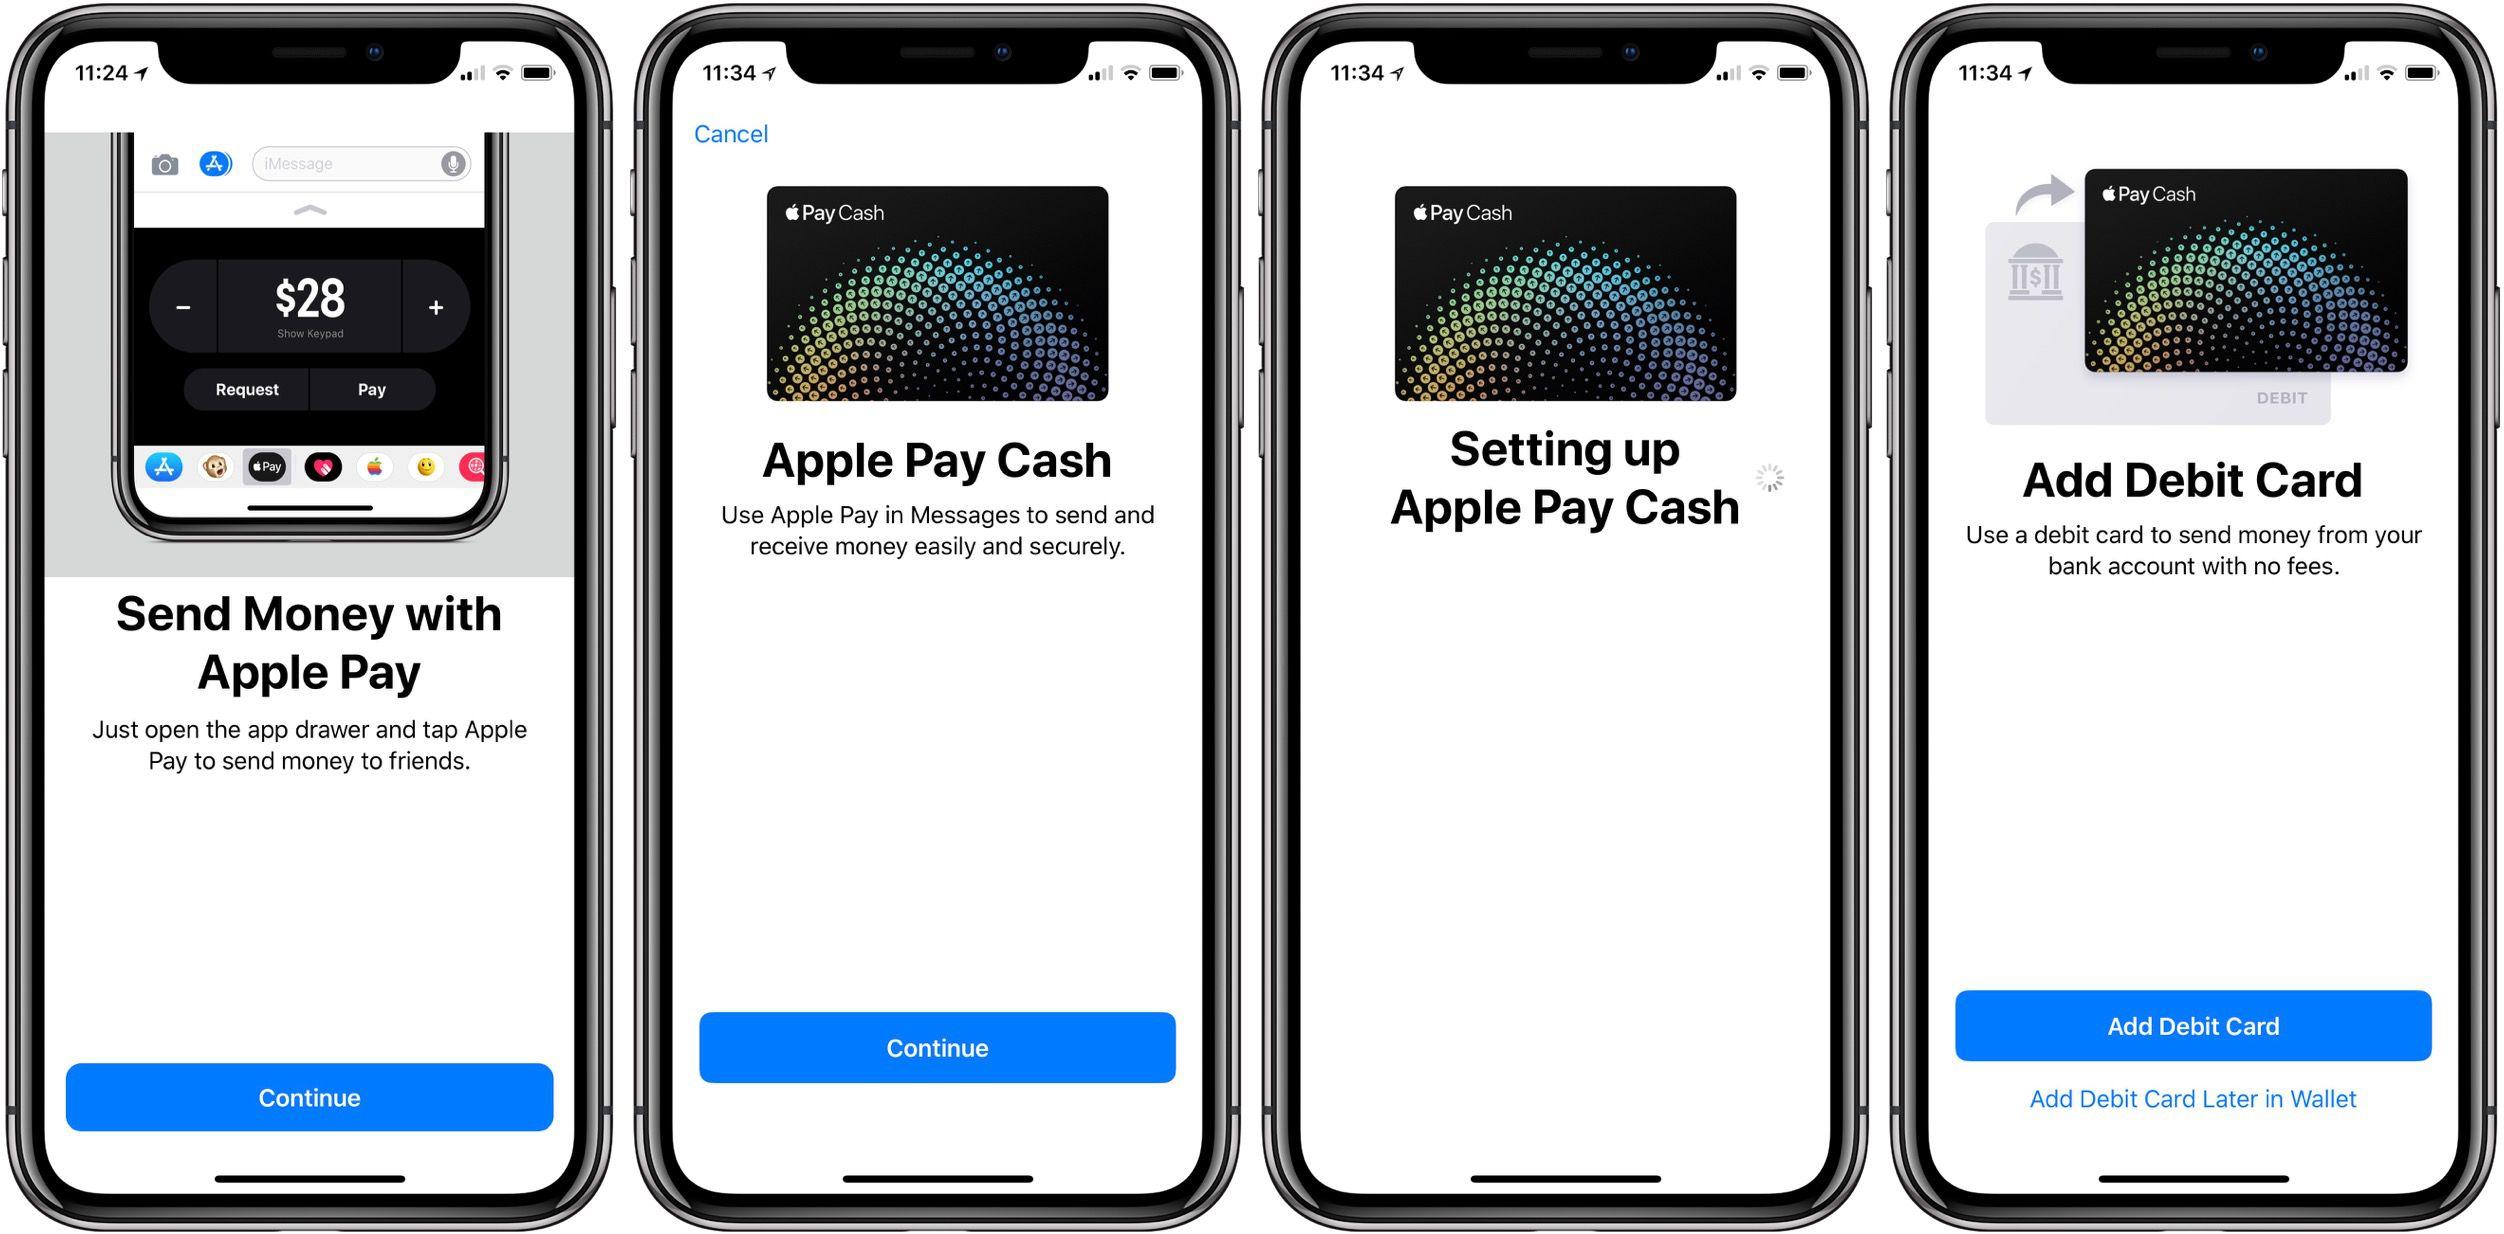 Apple Pay cash walkthrough 1